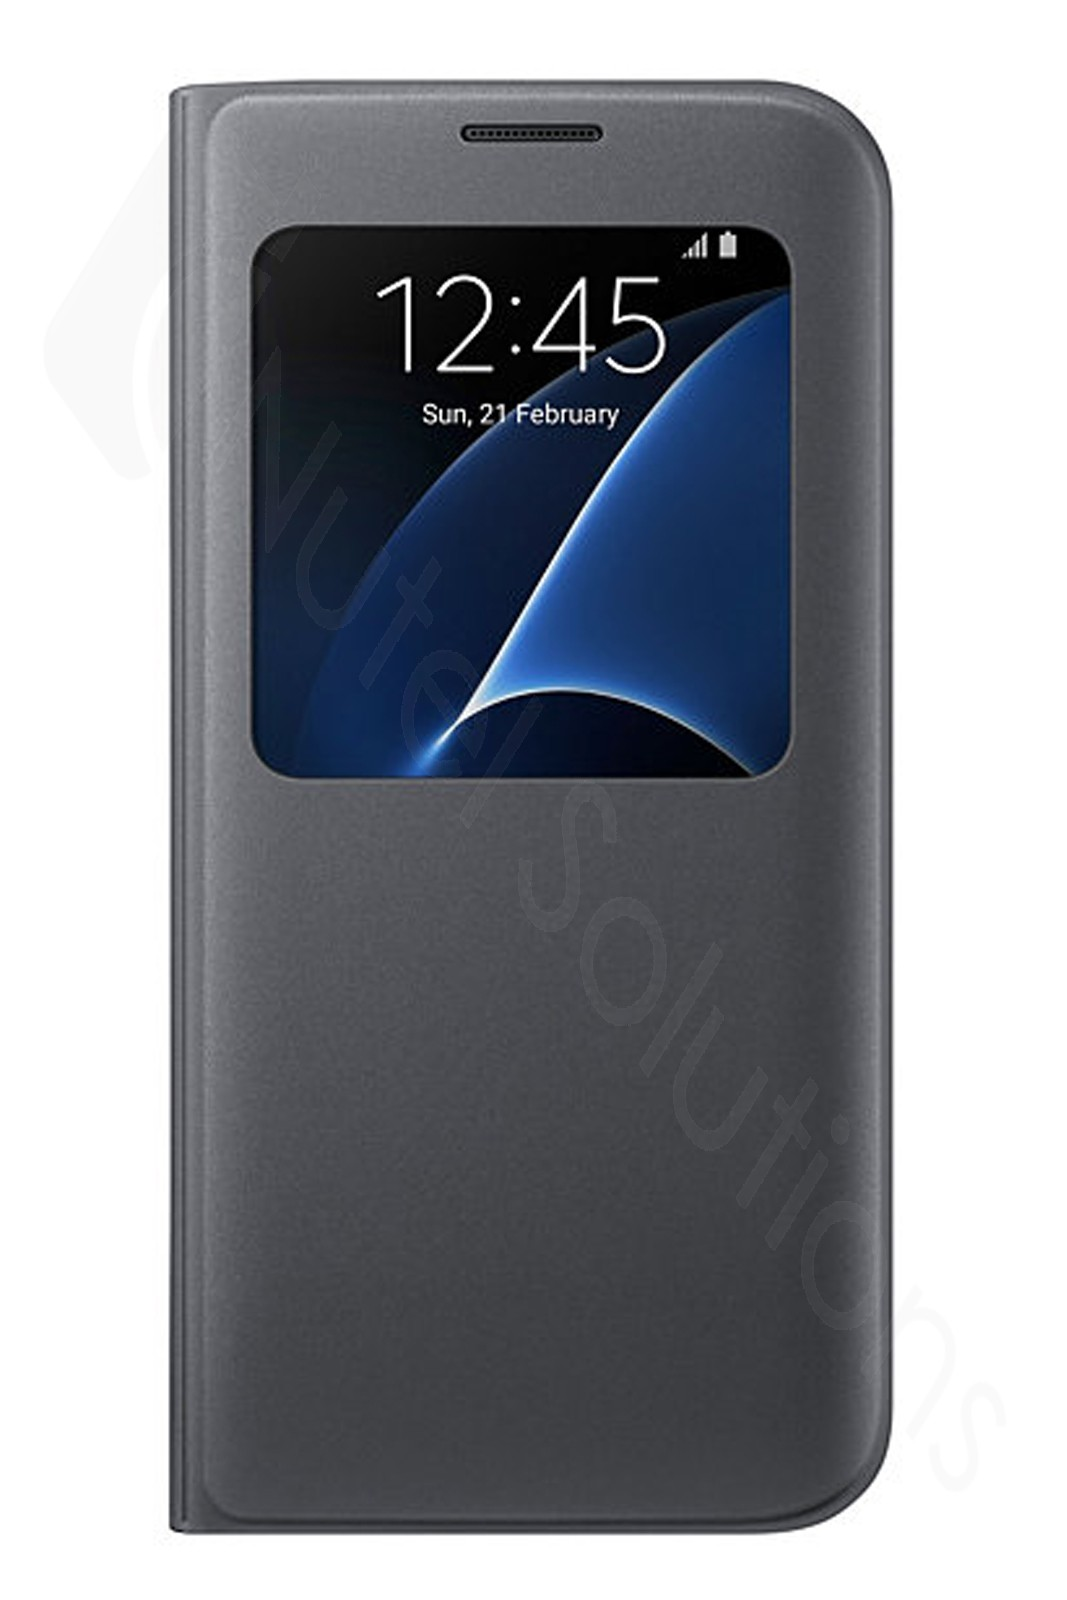 official samsung galaxy s7 edge black s view cover case ef cg935pbegww. Black Bedroom Furniture Sets. Home Design Ideas